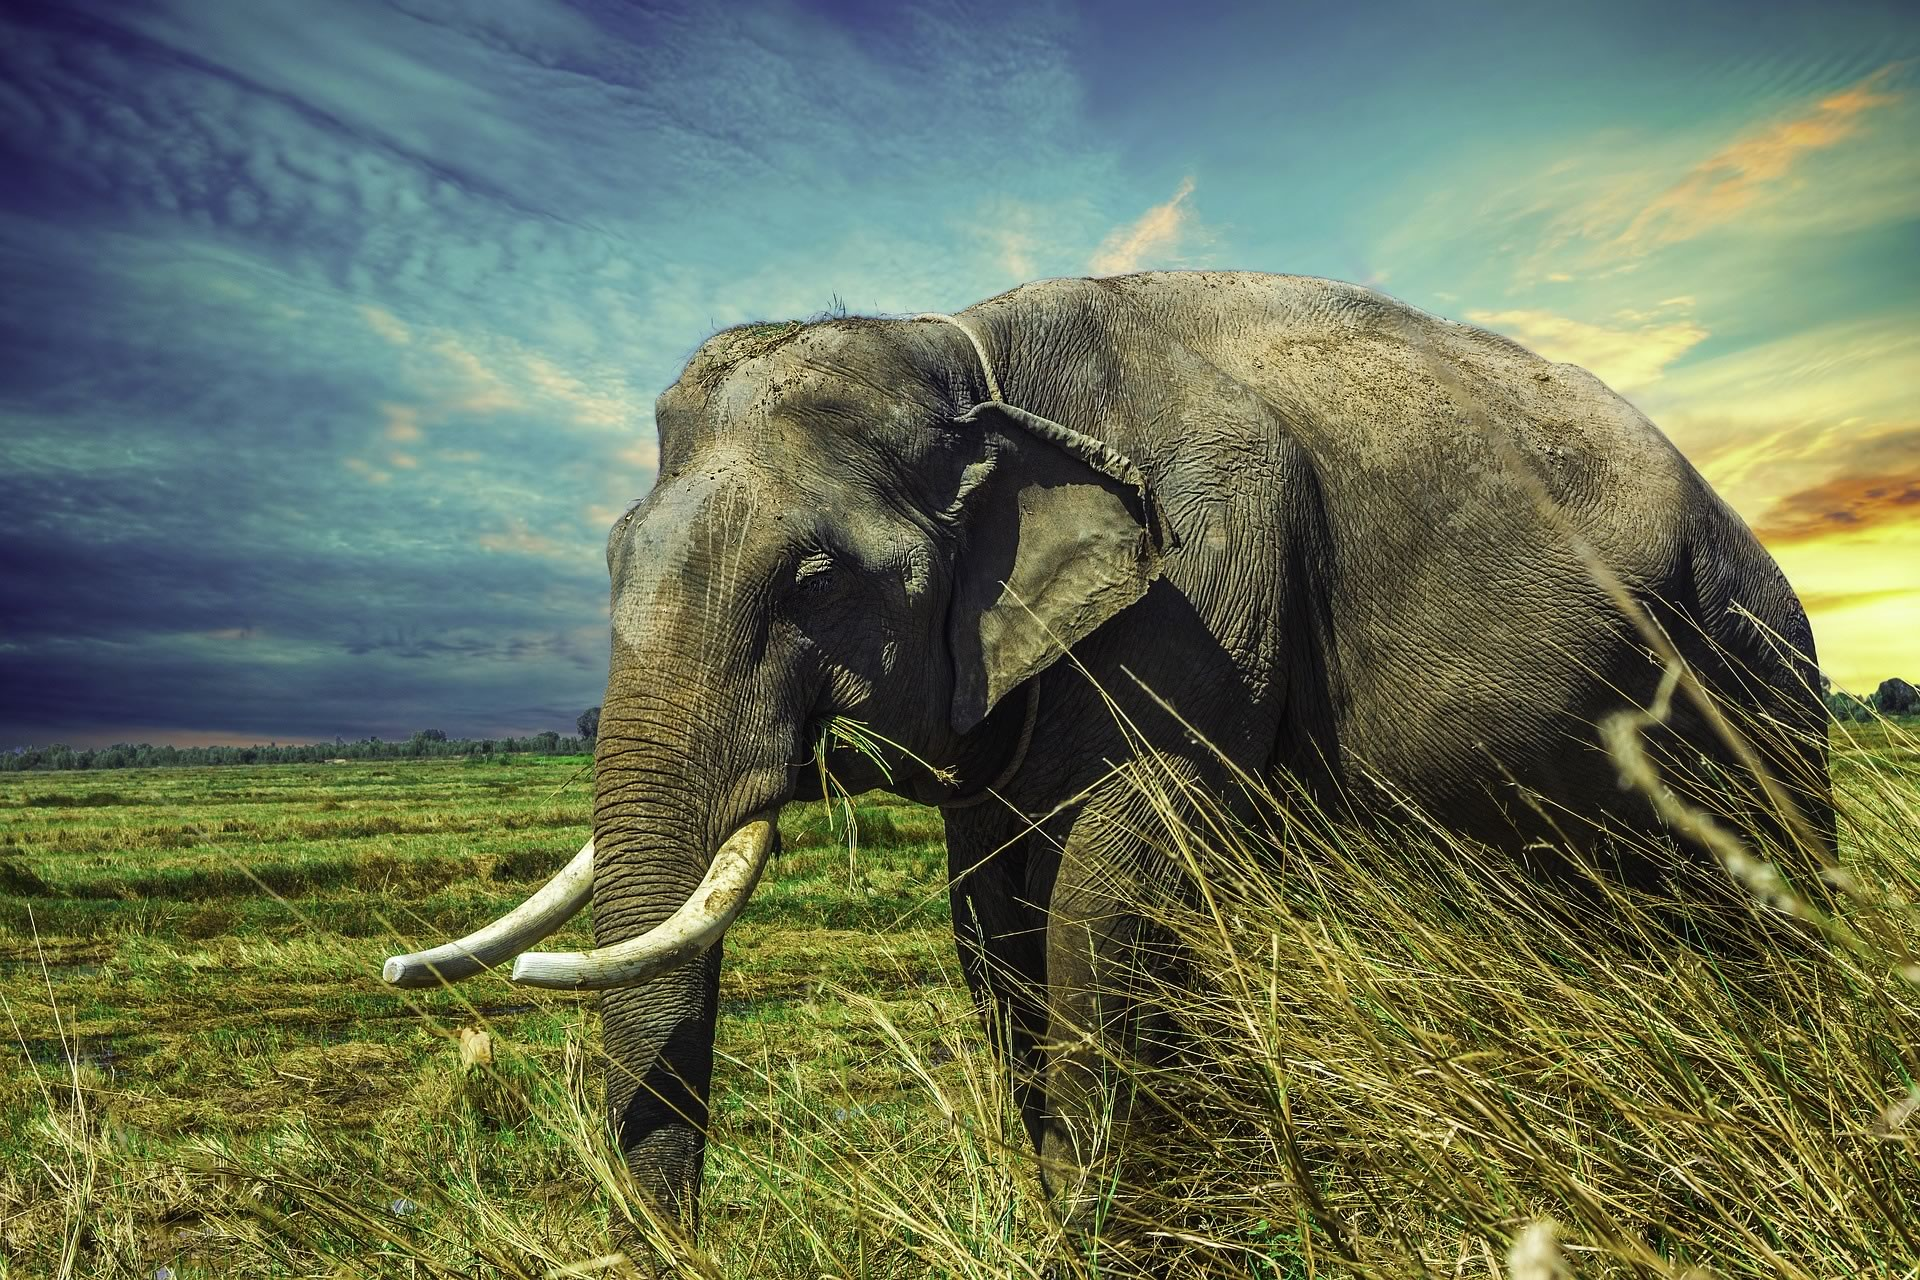 download wallpaper: olifant wallpaper